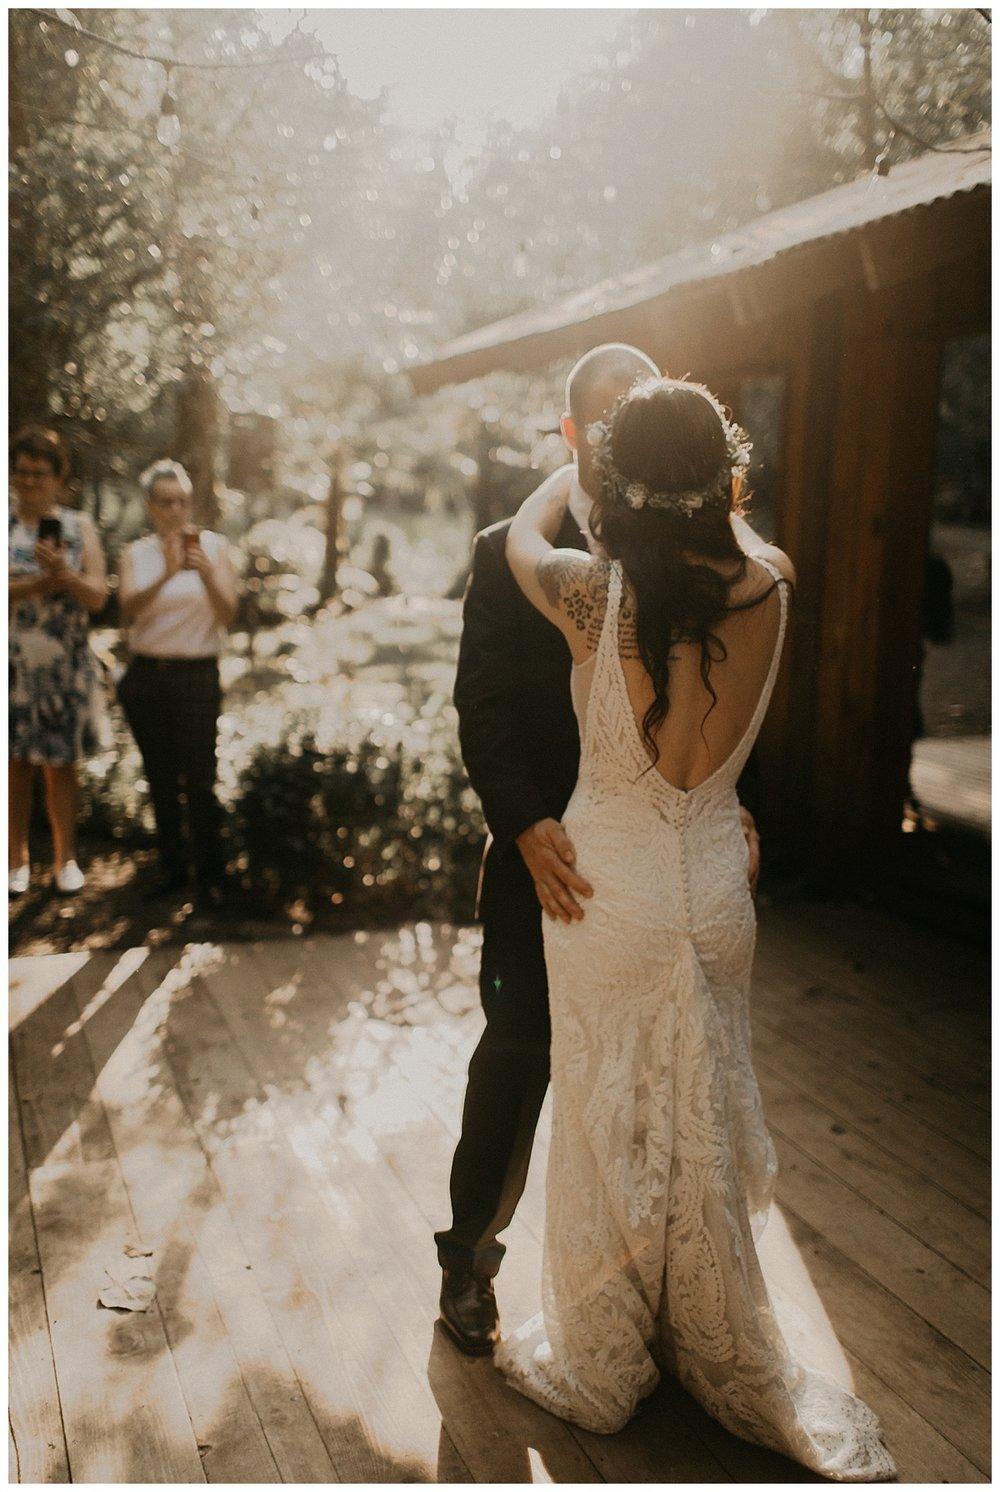 Samantha-McFarlen-PNW-Wedding-Photographer-Maroni-Meadows_1962.jpg